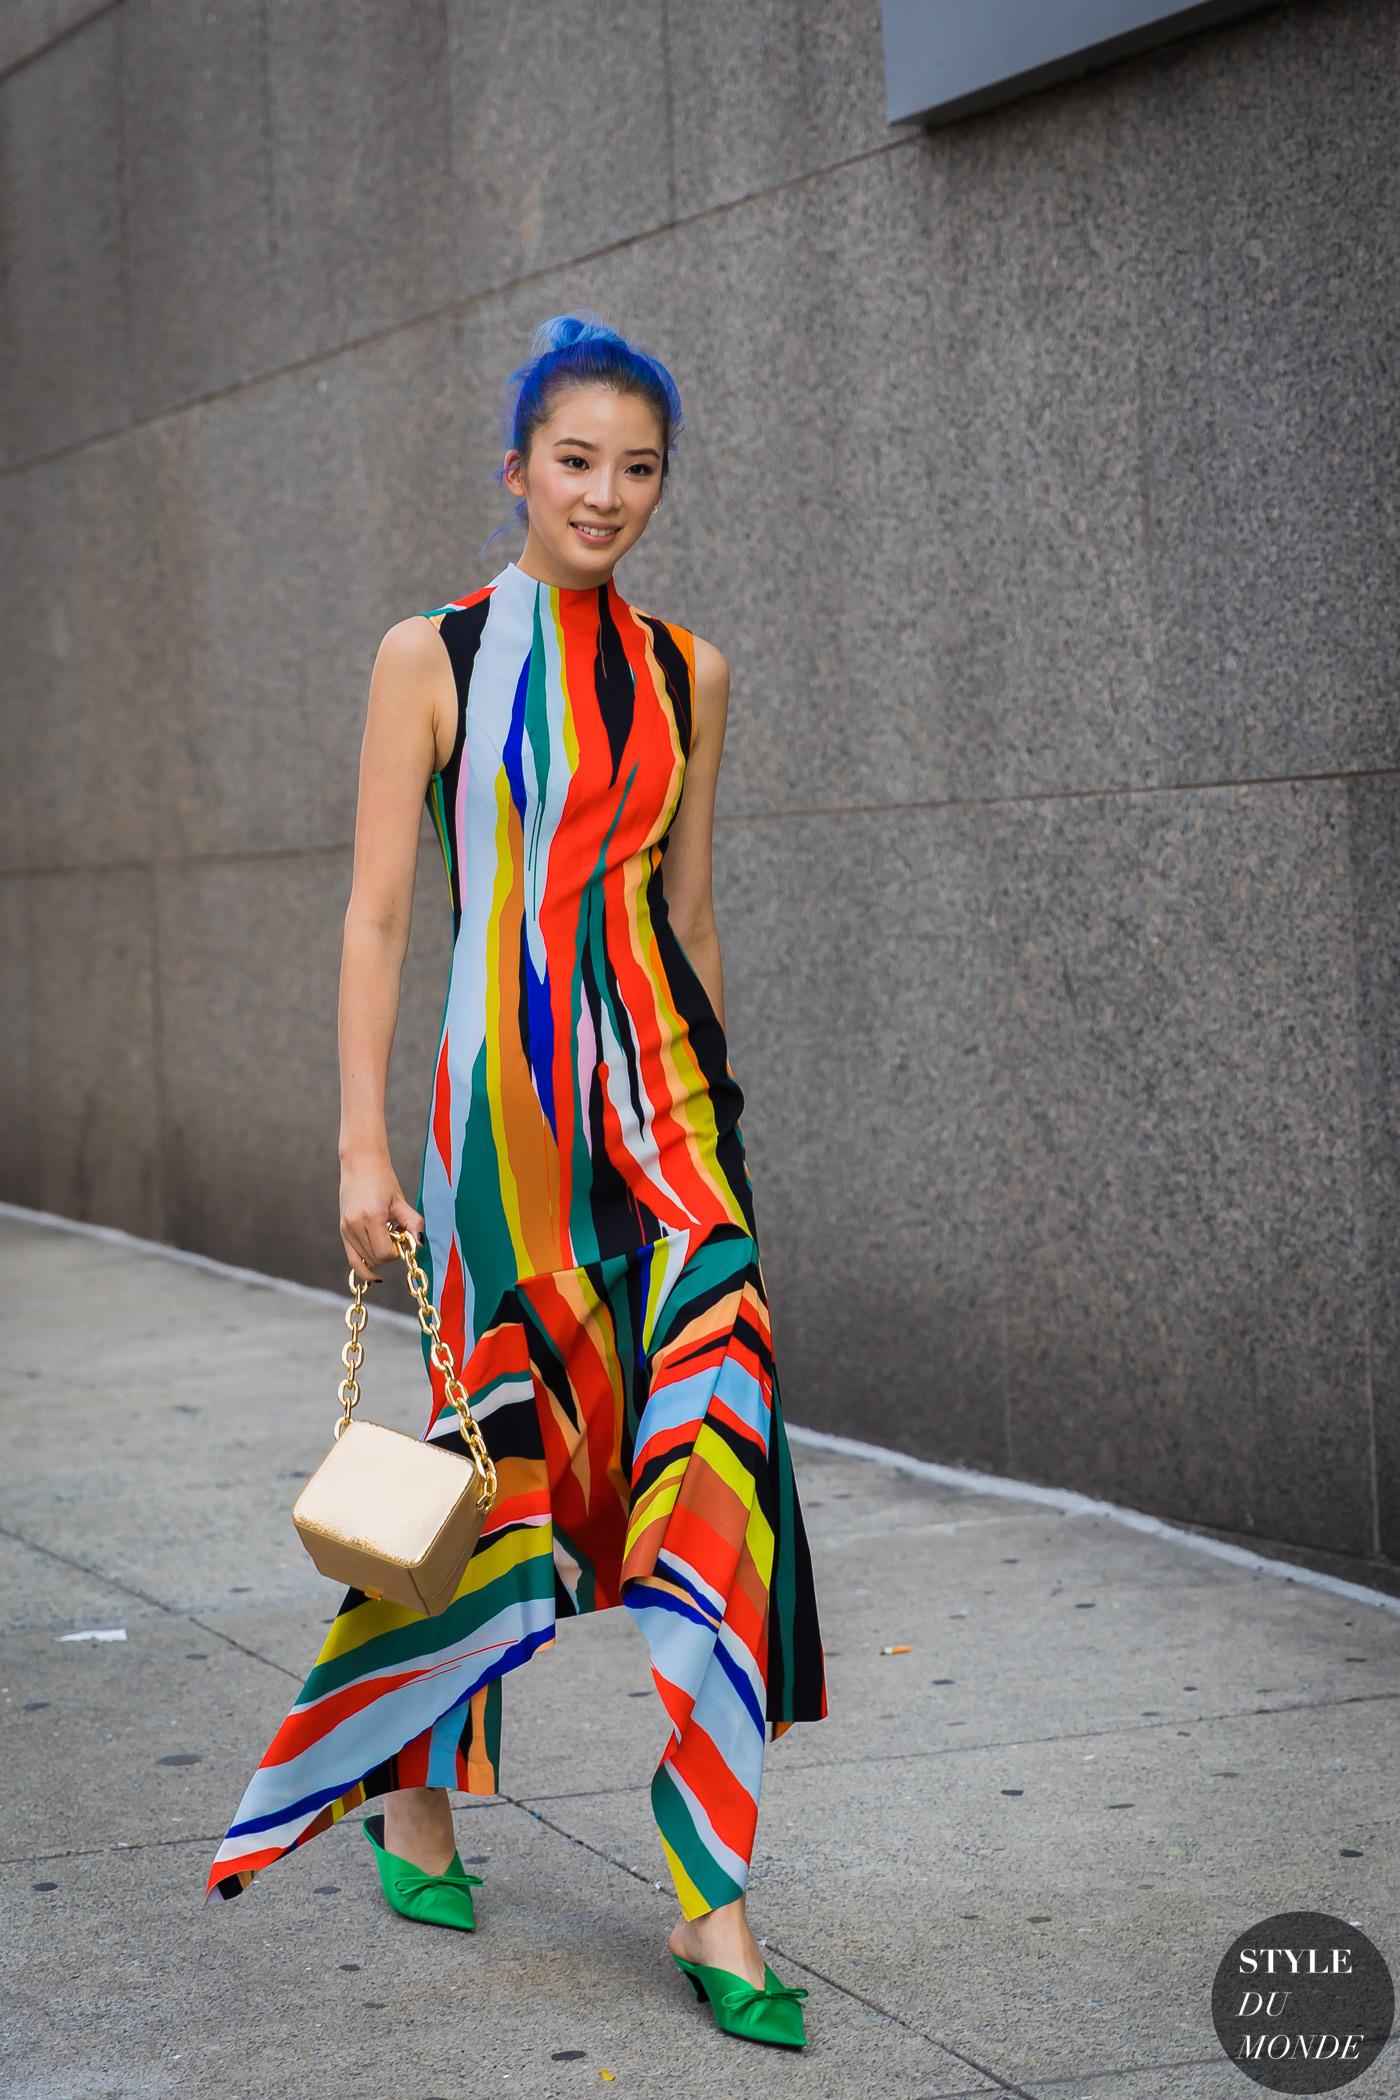 Image for New York SS 2018 Street Style: Irene Kim